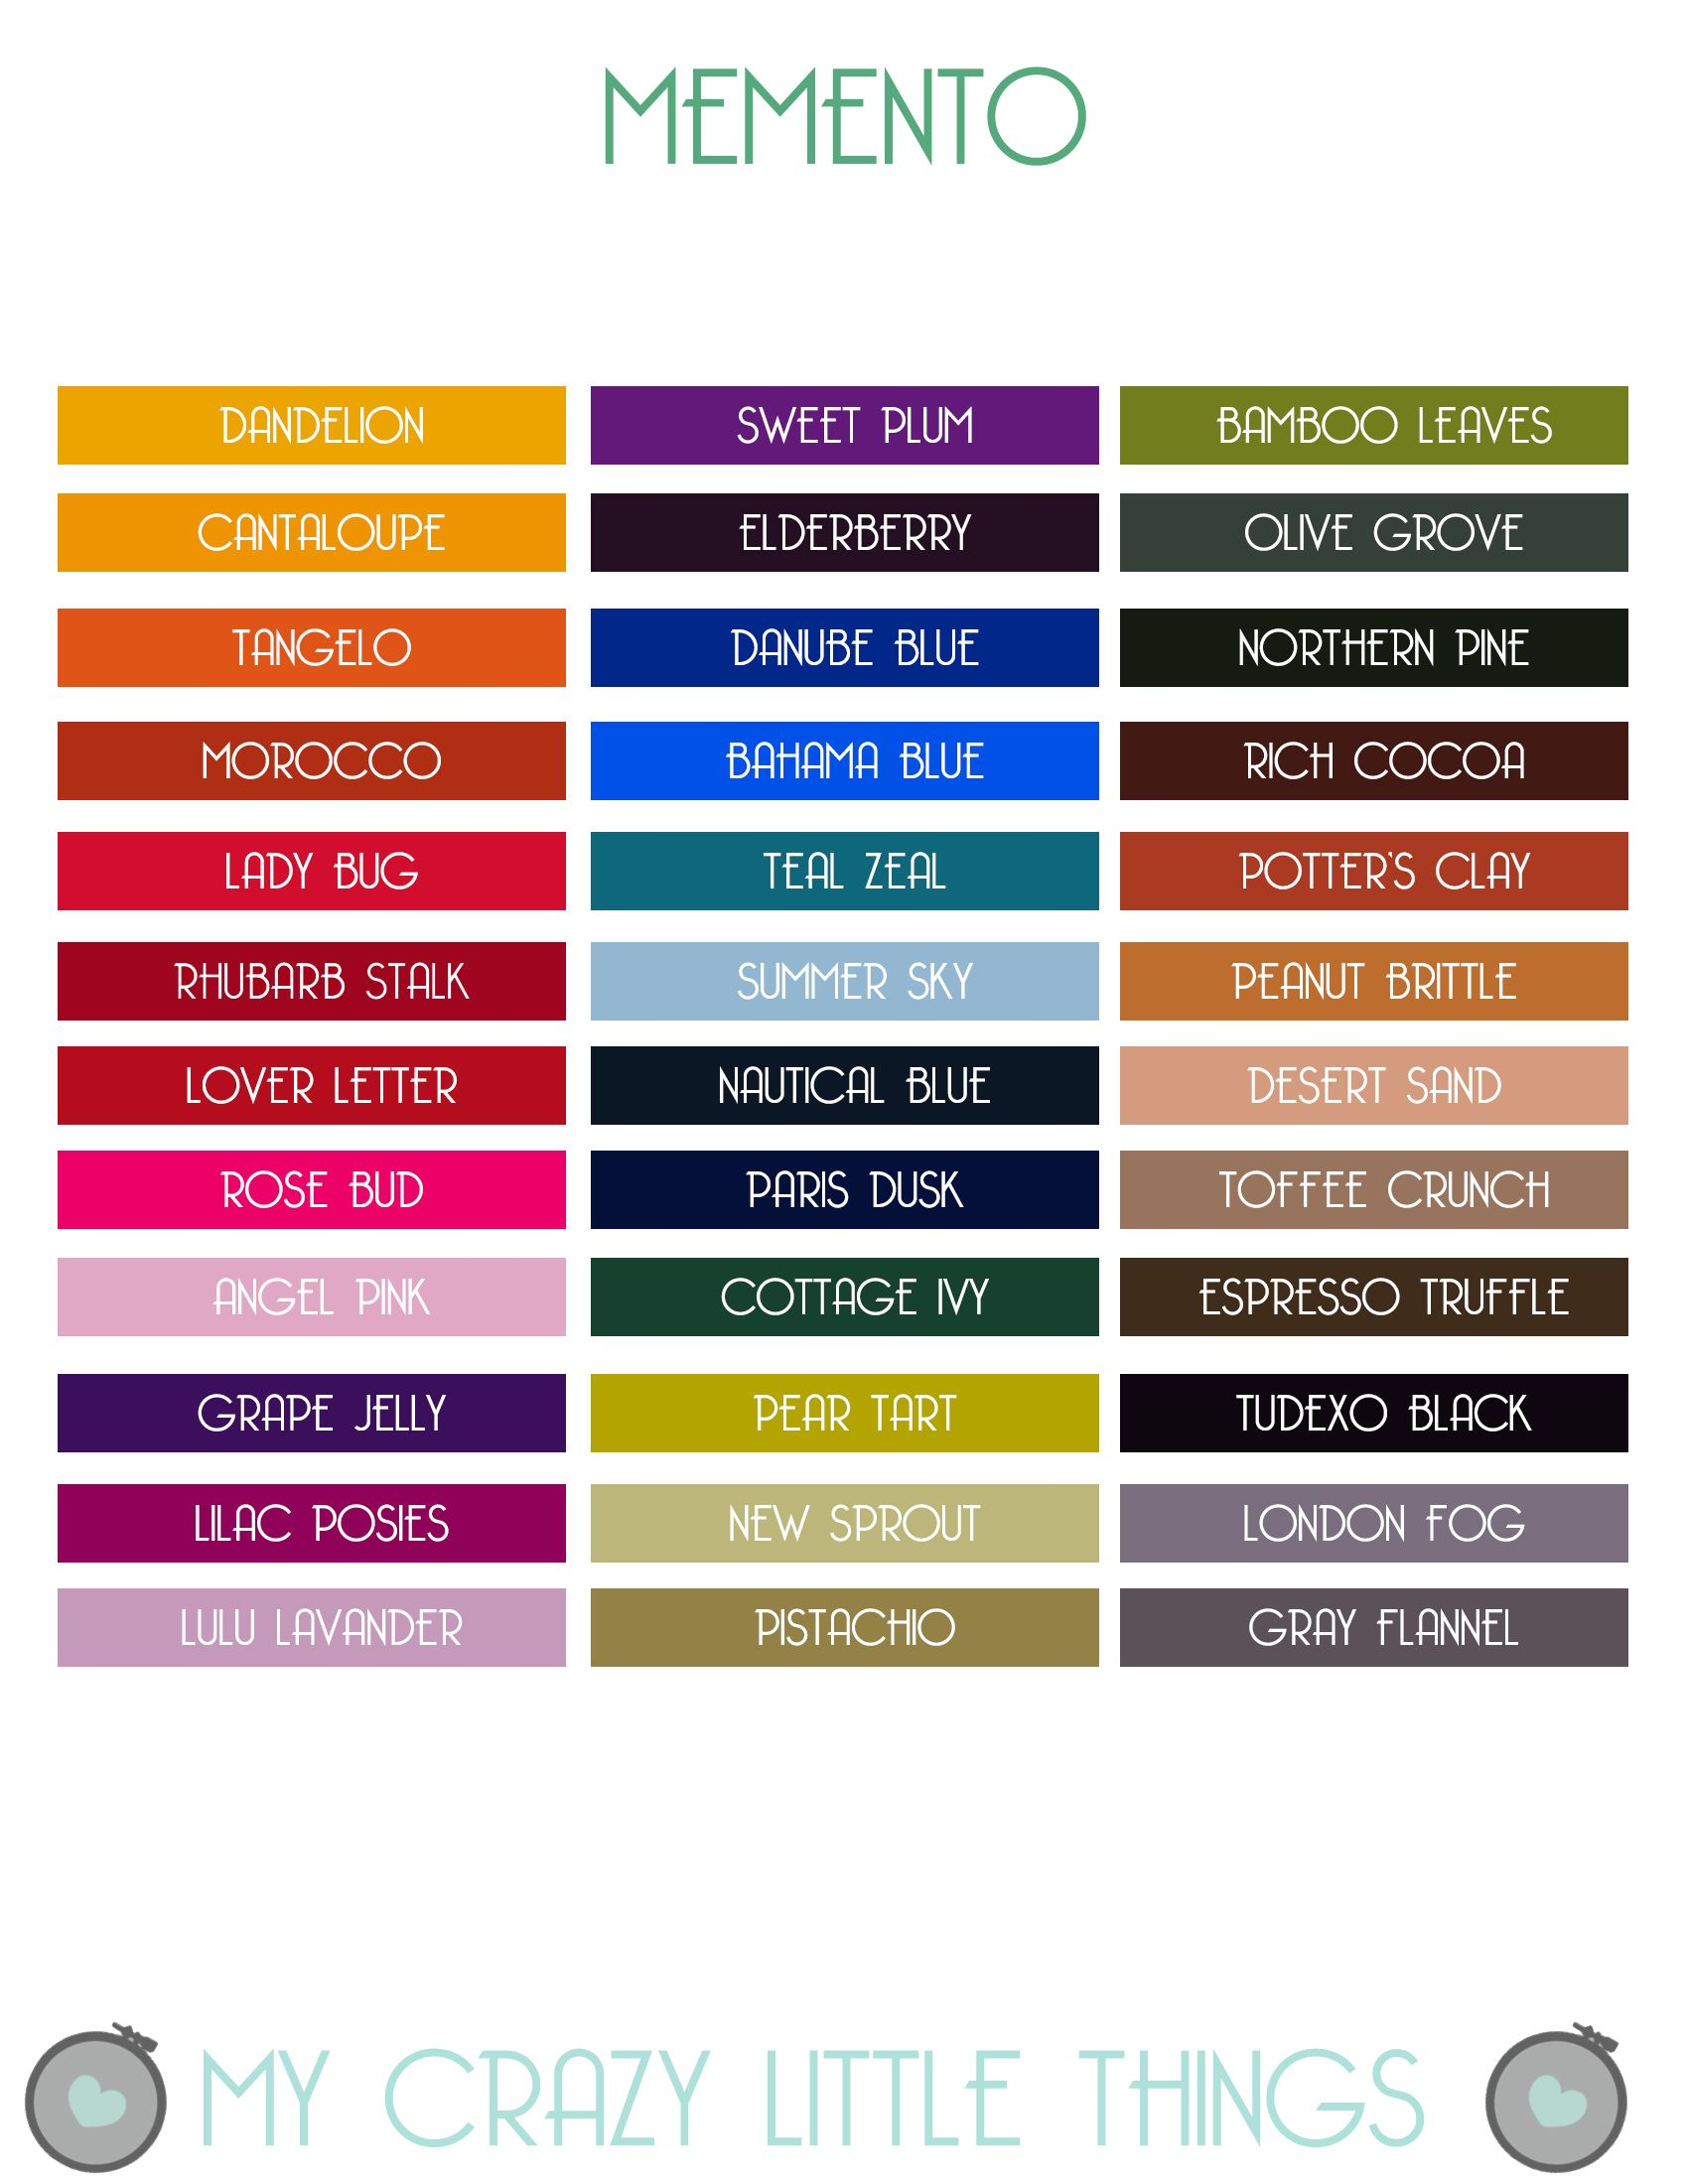 Etiquetas tintas memento printables pinterest colour chart etiquetas tintas memento craft organizationcraft storagecolour chartmixed media journalink nvjuhfo Image collections